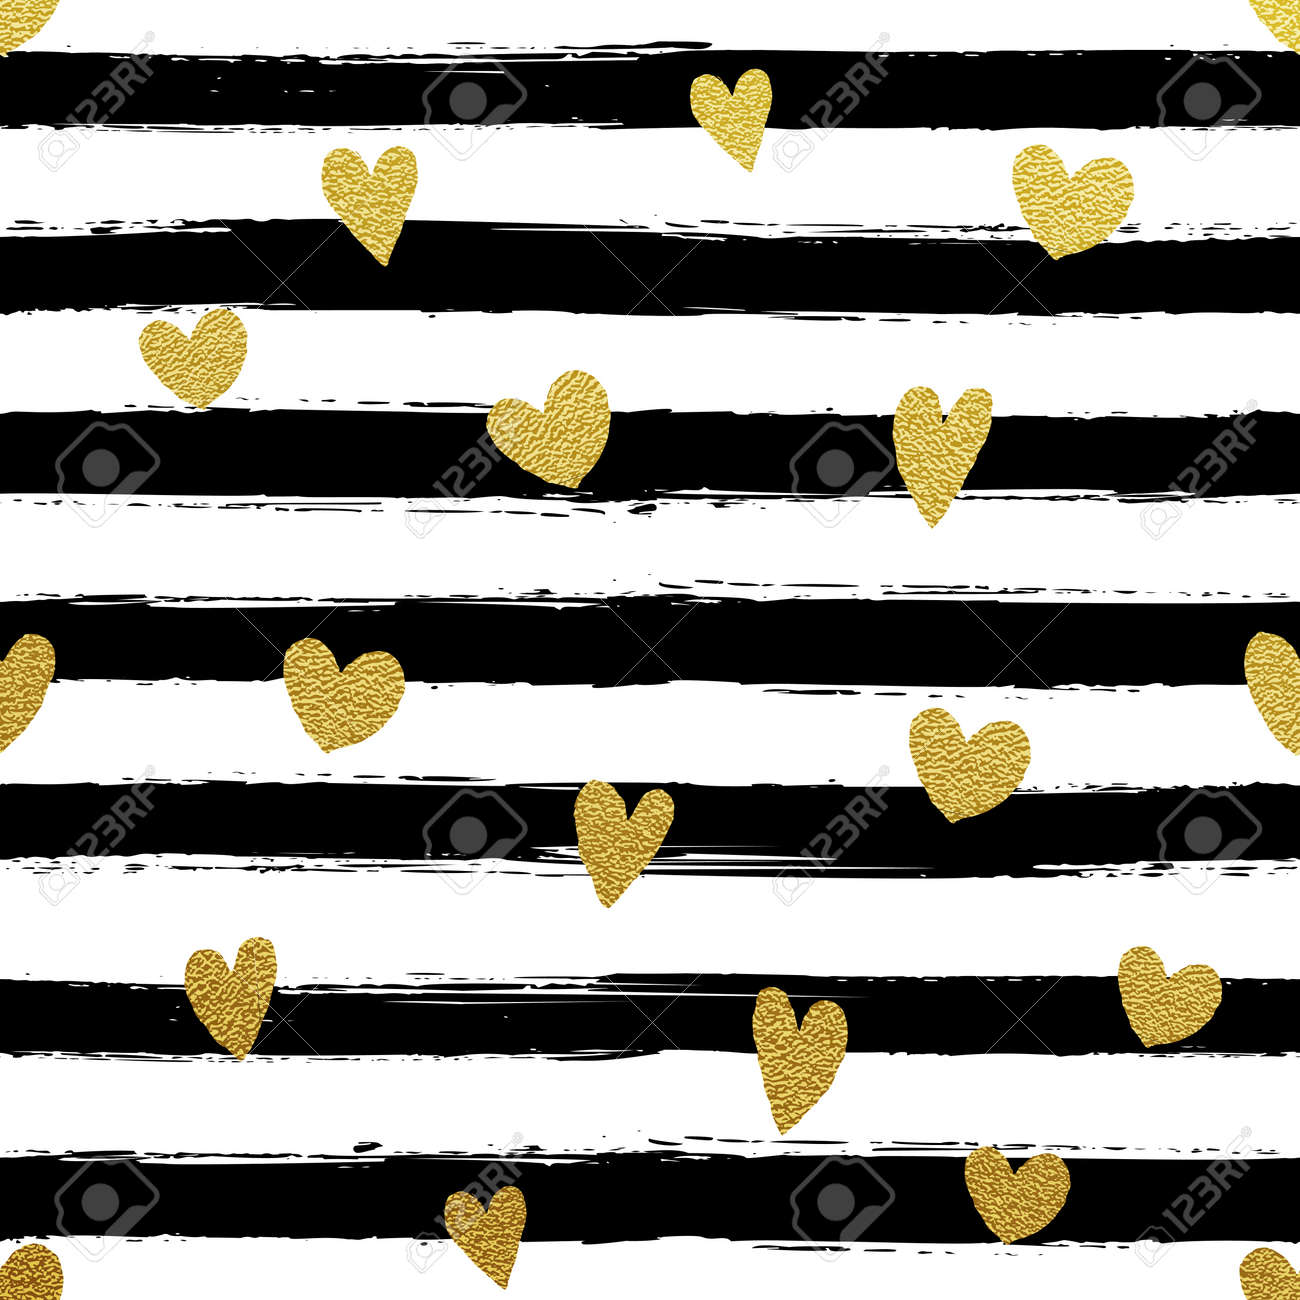 Glitter gold striped wallpaper. Paint brush strokes background. Black and white calligraphy stripes. Golden heart pattern. Hipster trendy vector illustration. - 57341605